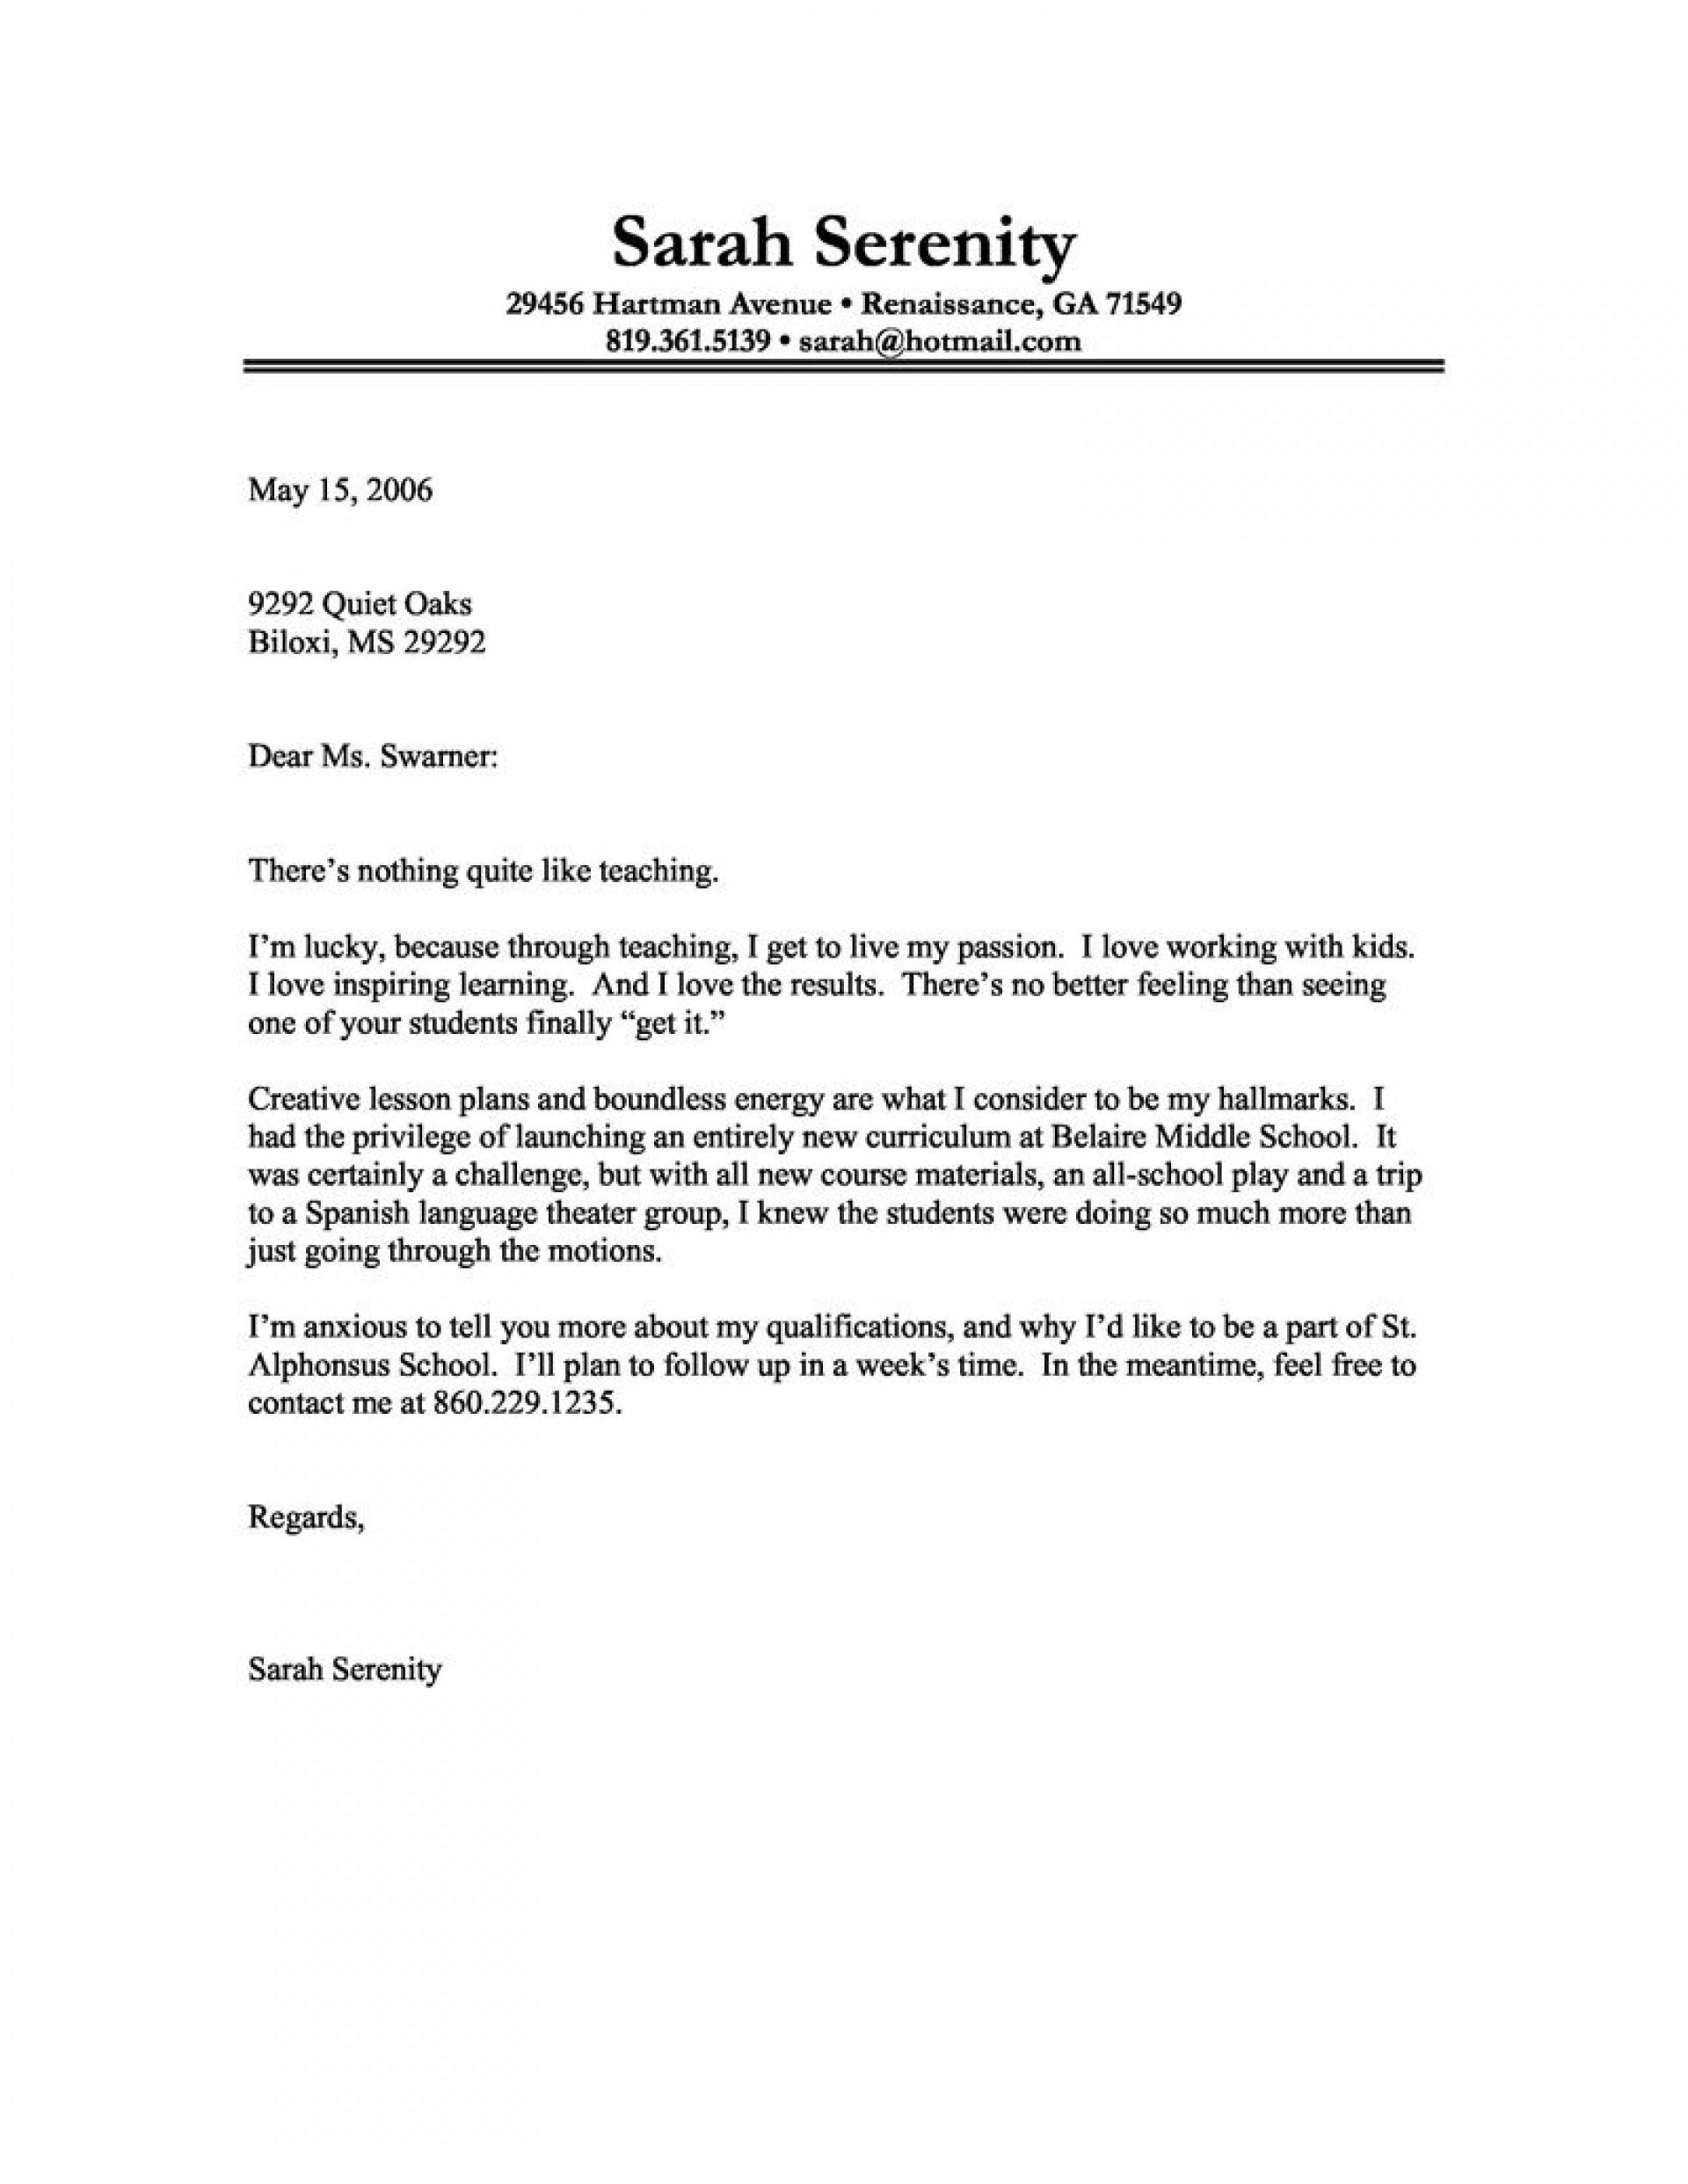 005 Magnificent Teacher Cover Letter Template Concept  Teaching Job1920